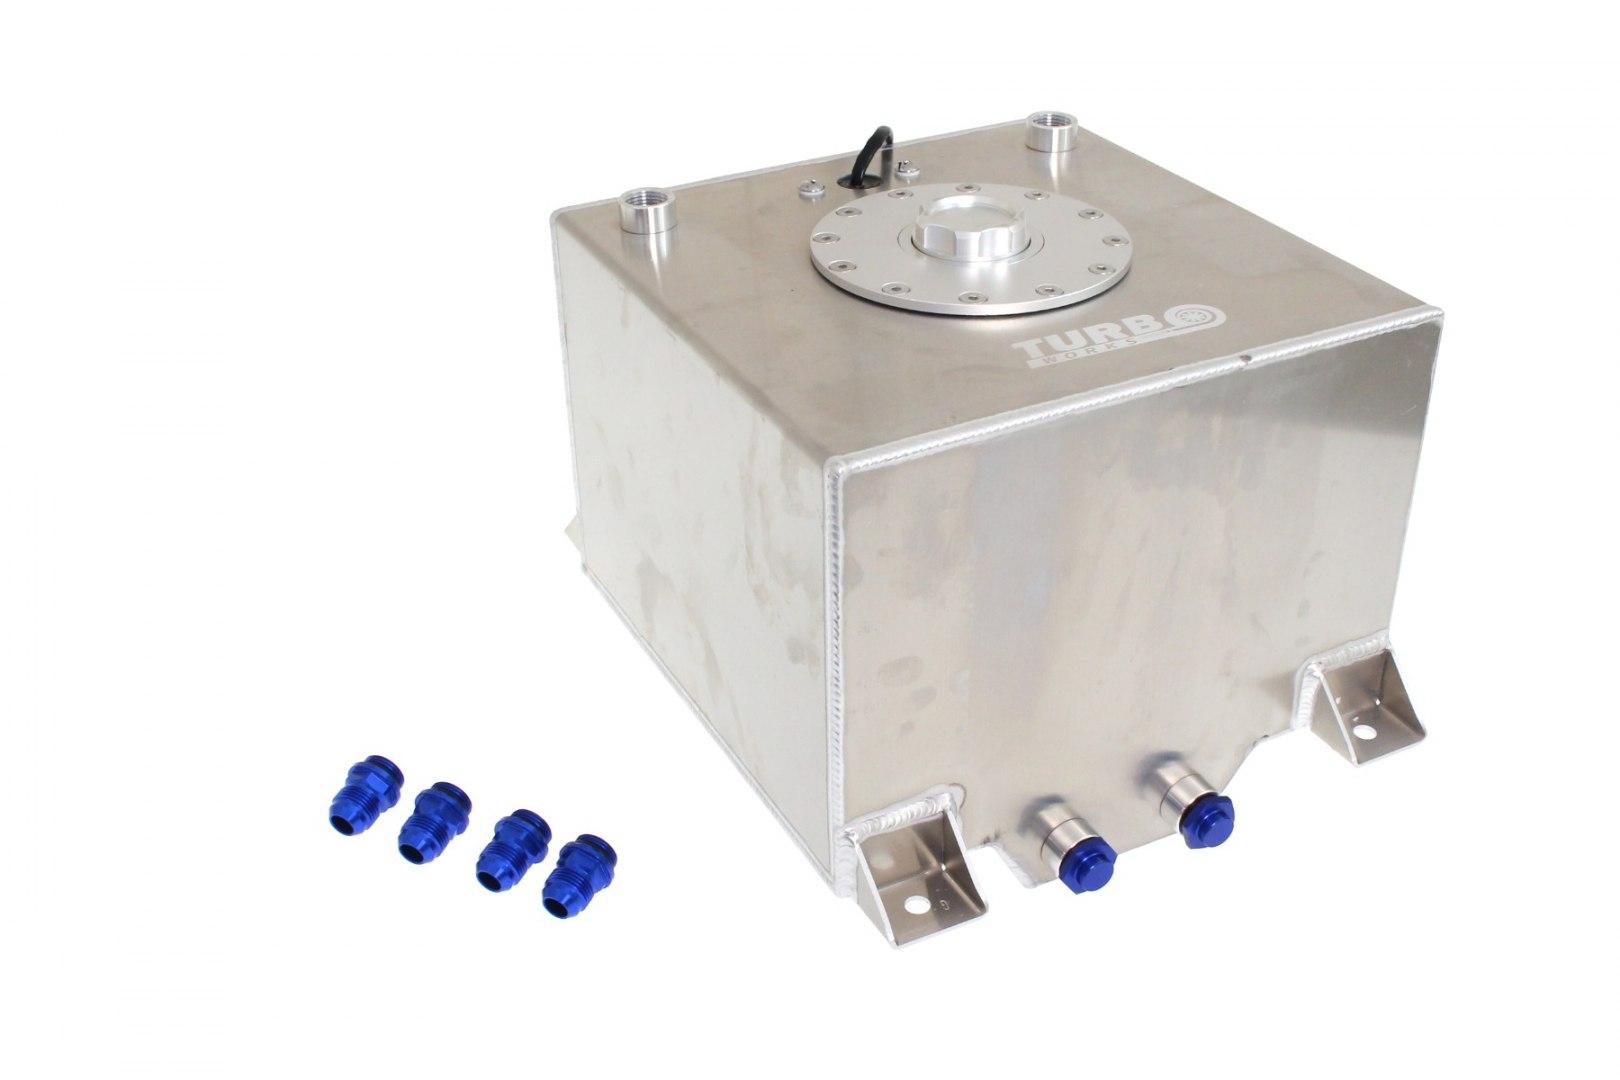 Zbiornik Paliwa Aluminiowy TurboWorks 60L - GRUBYGARAGE - Sklep Tuningowy